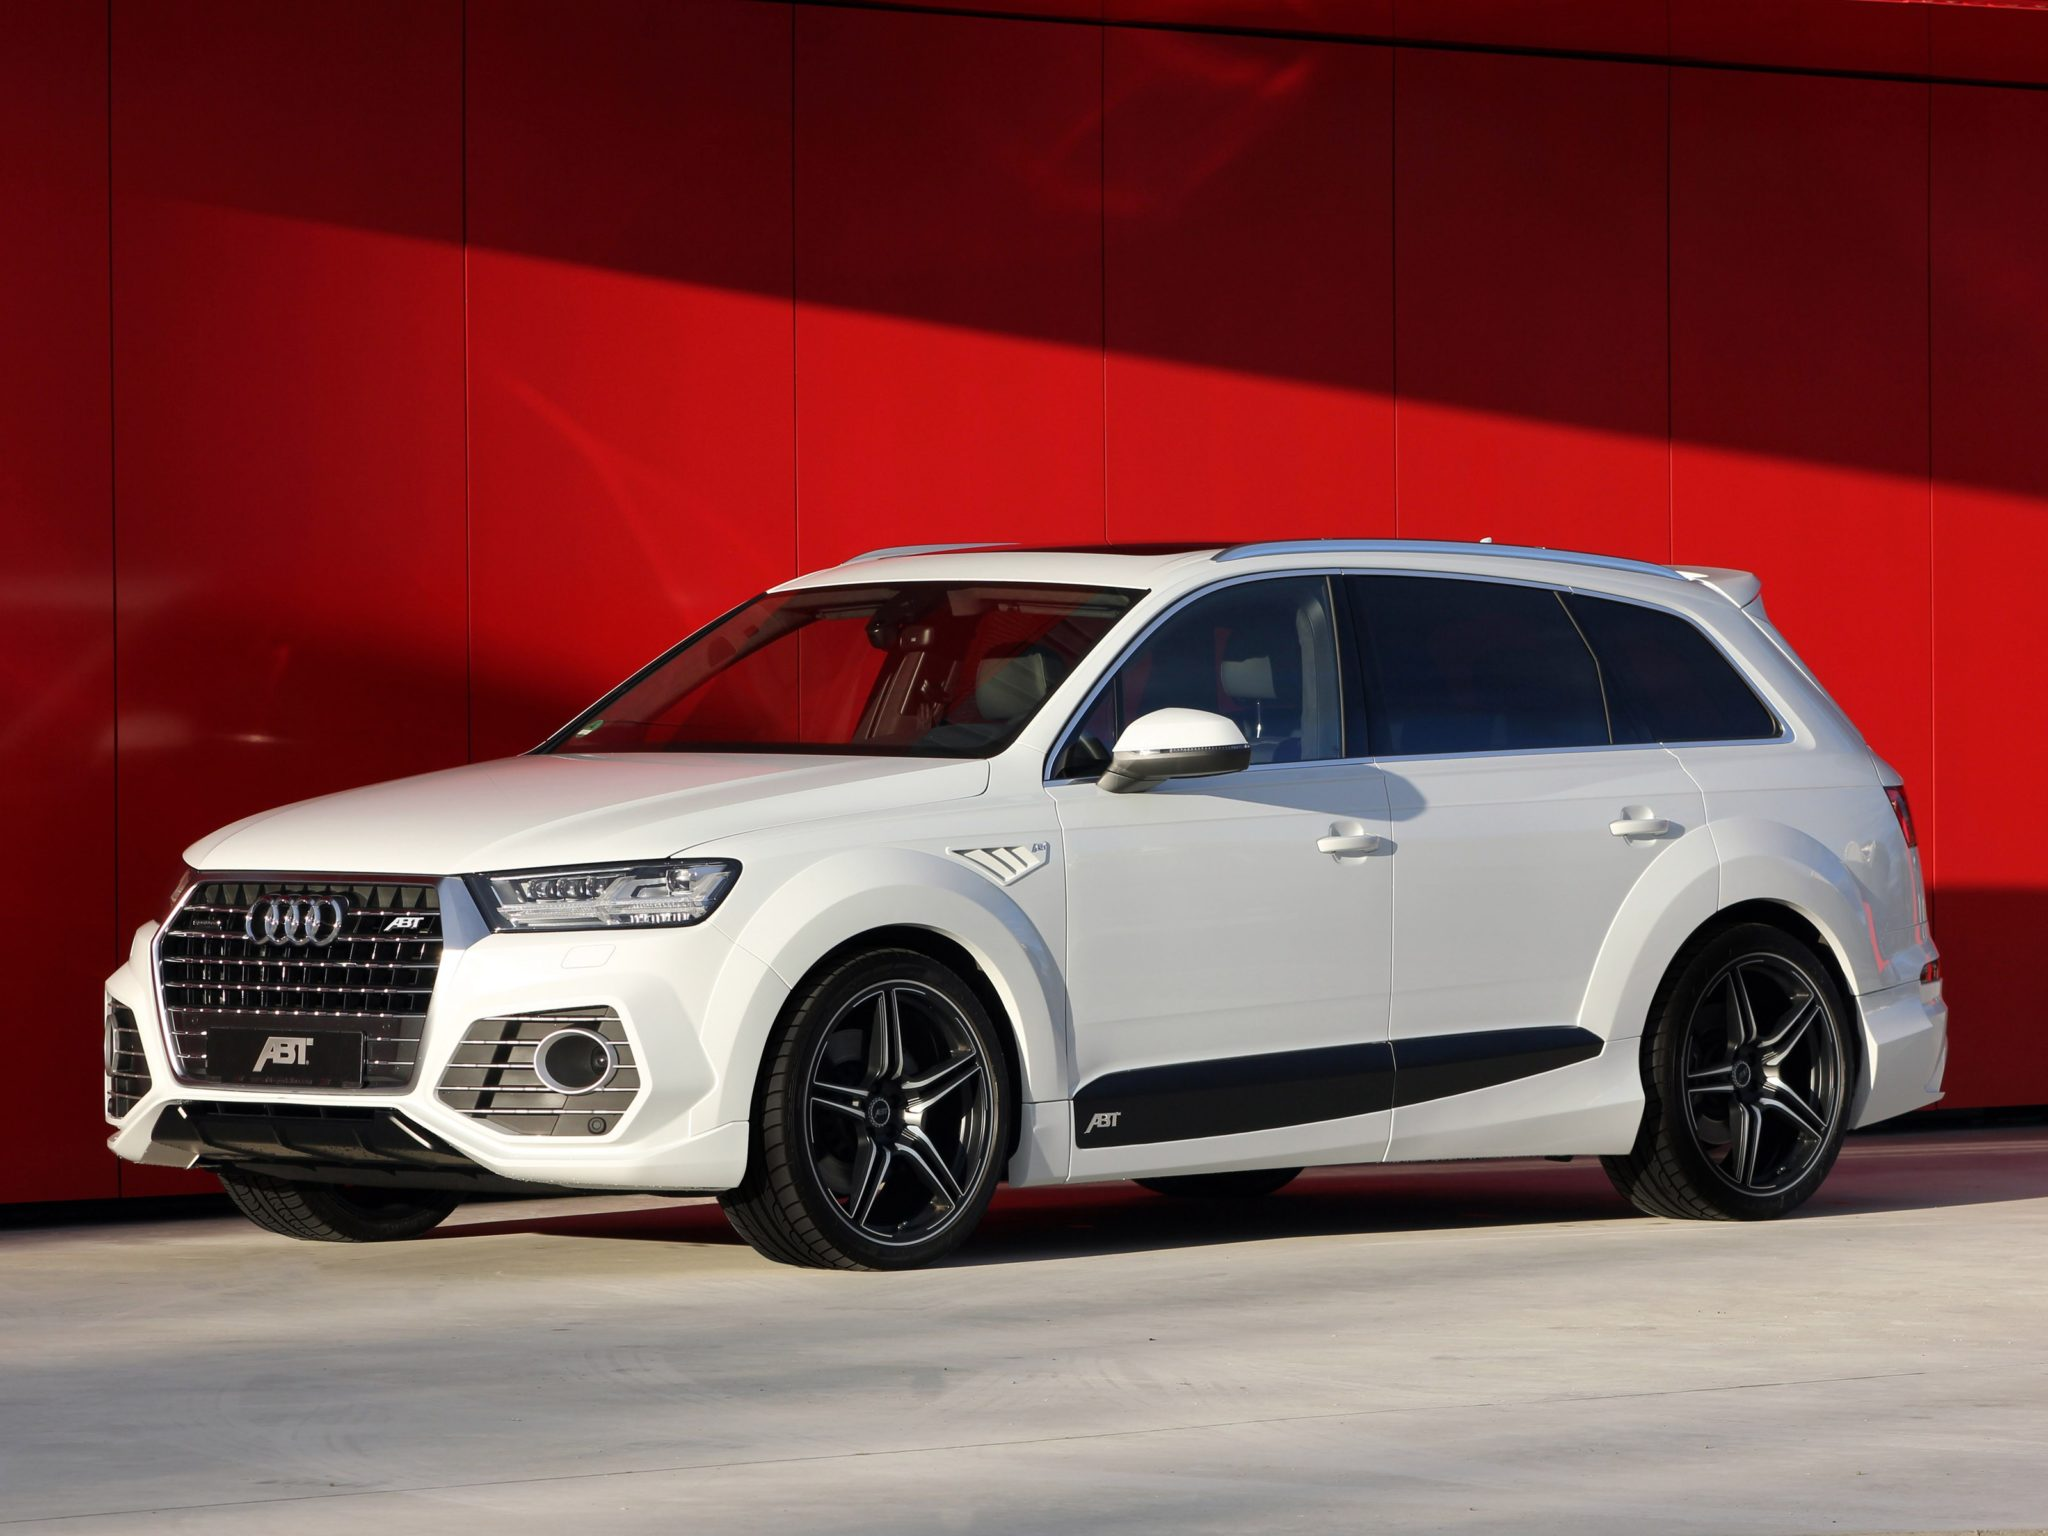 2016 ABT Audi QS7